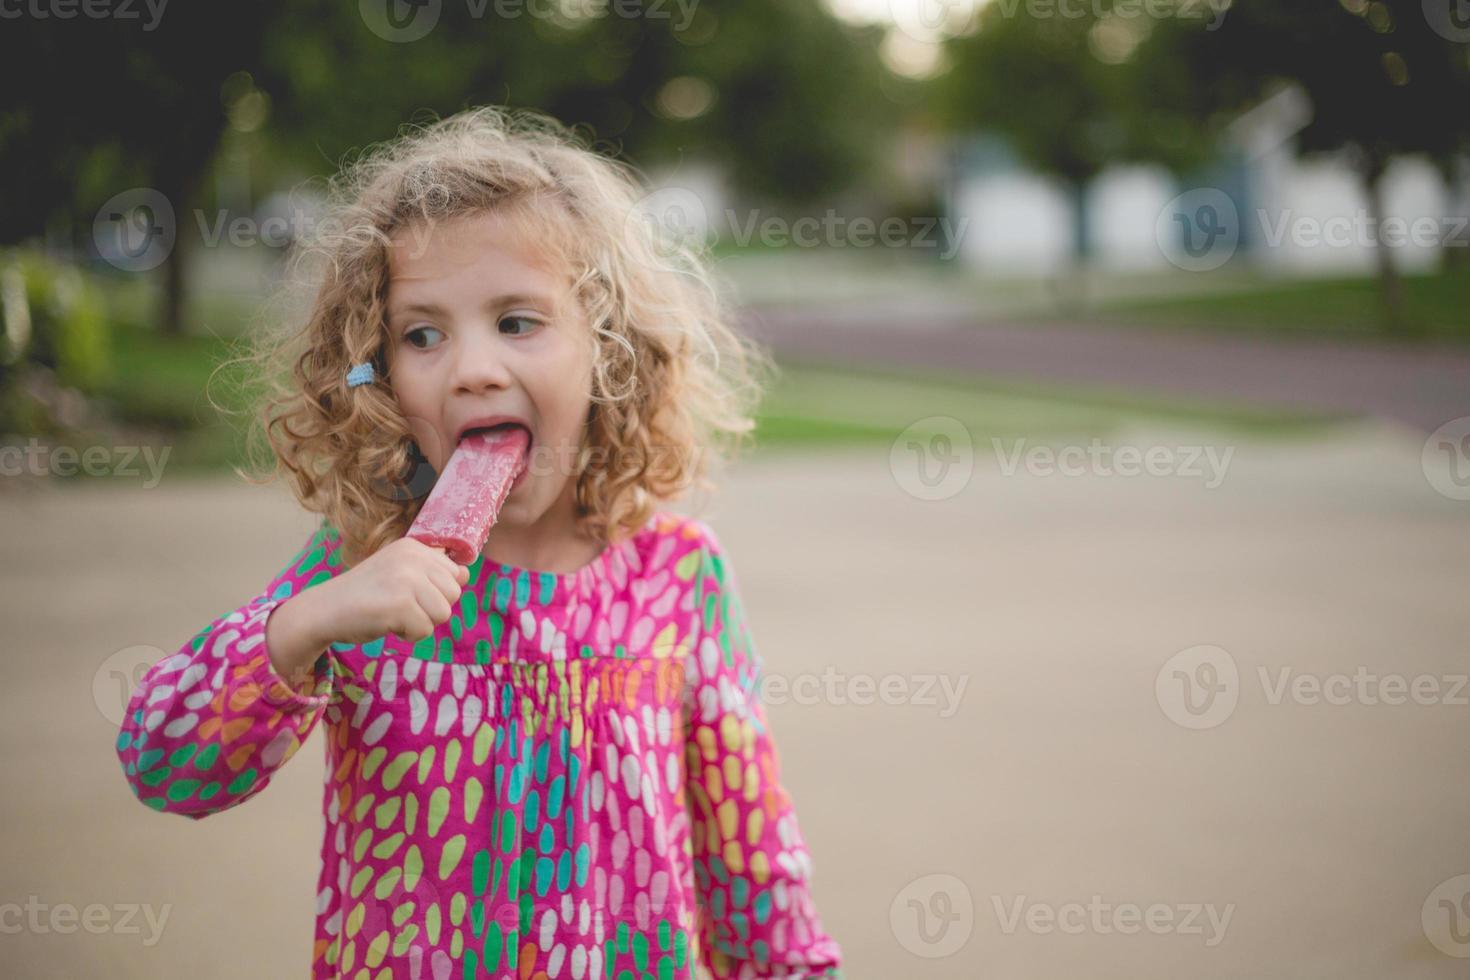 garota comendo picolé foto